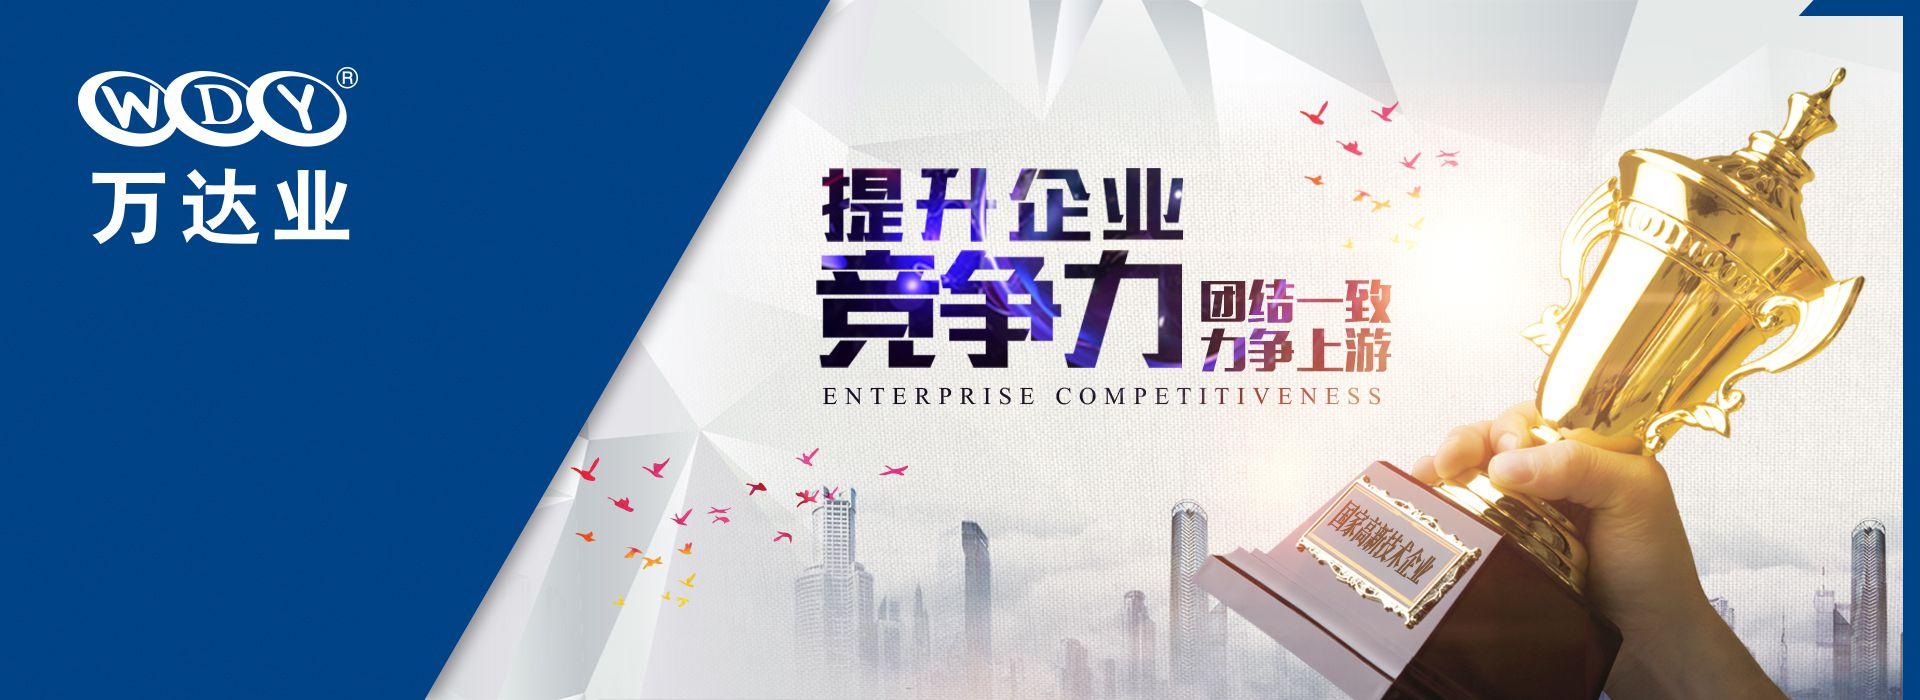 s10英雄联meng下zhu平台 ti升企业he心竞争力 tuanjieyi致力争shang游